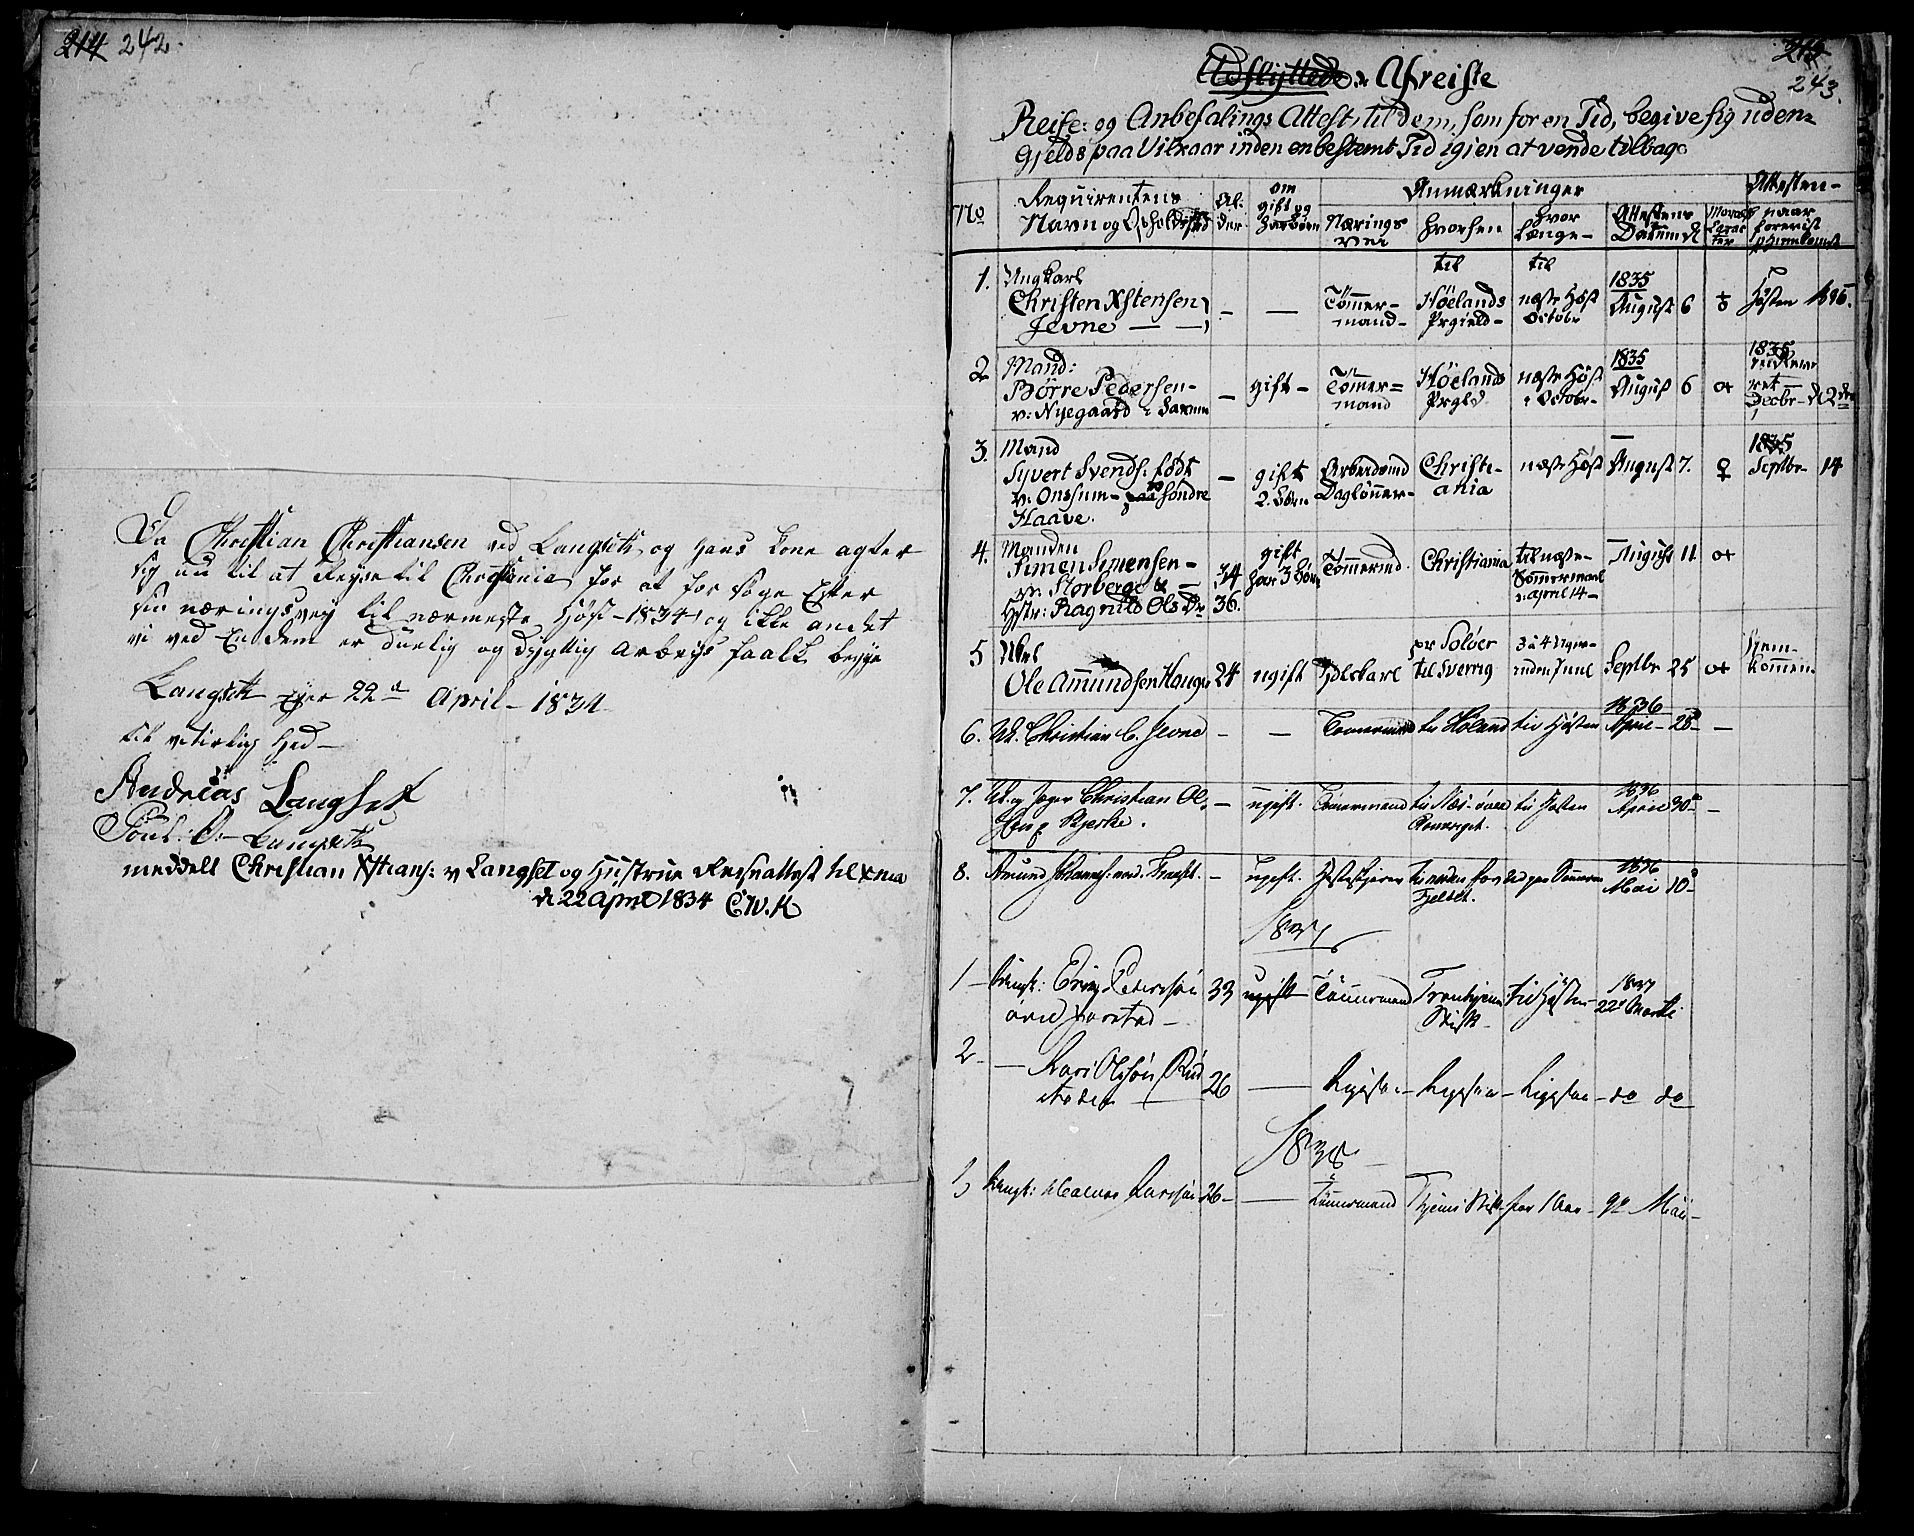 SAH, Fåberg prestekontor, Ministerialbok nr. 4, 1833-1837, s. 242-243